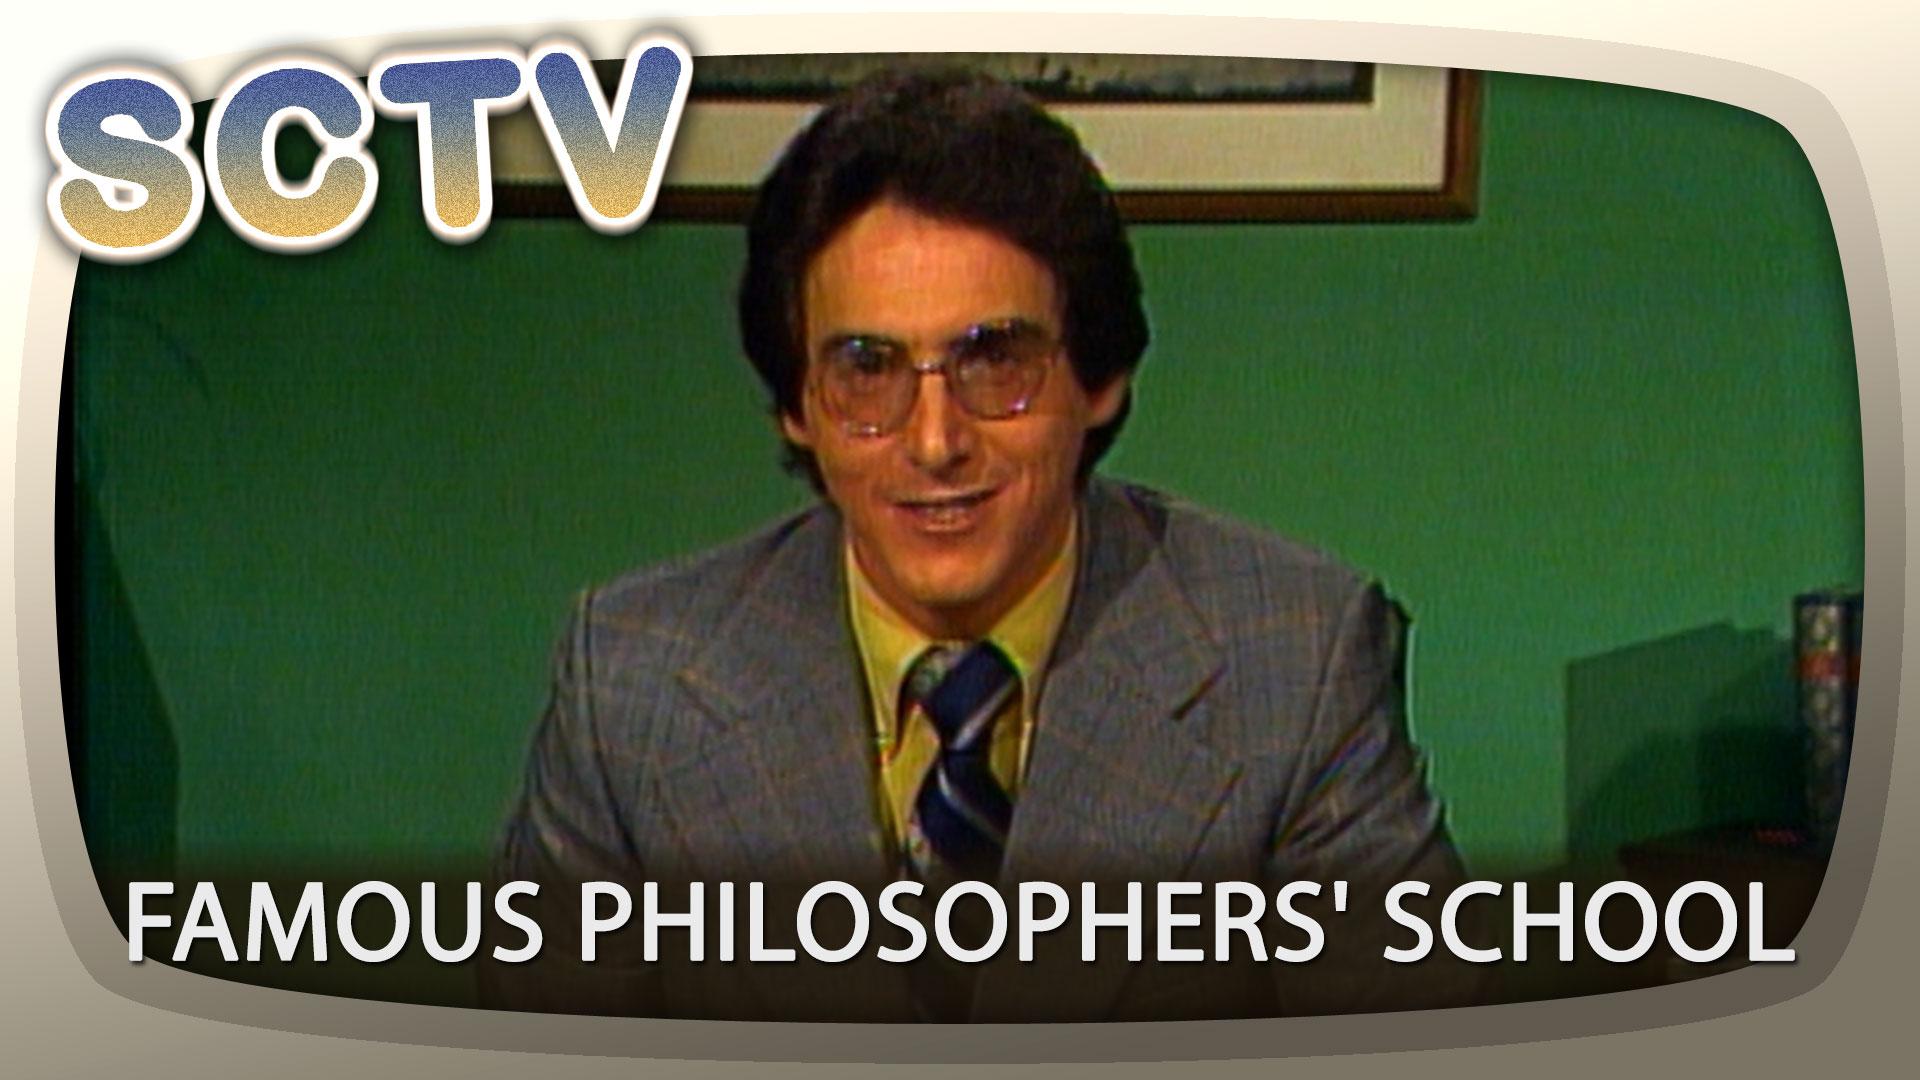 SCTV: Famous Philosophers' School with Harold Ramis